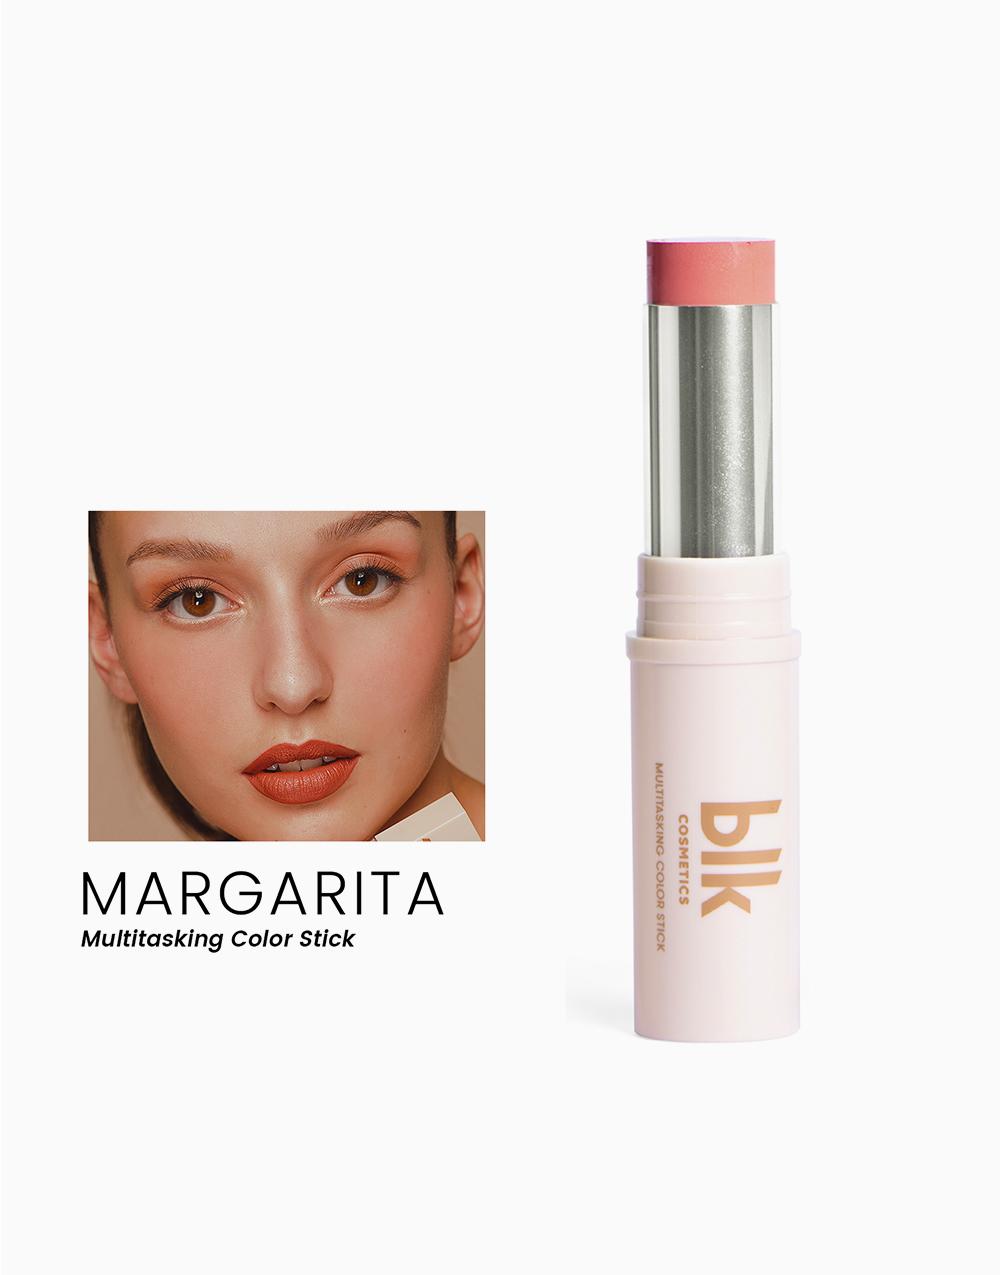 Multitasking Color Stick by BLK Cosmetics   Margarita